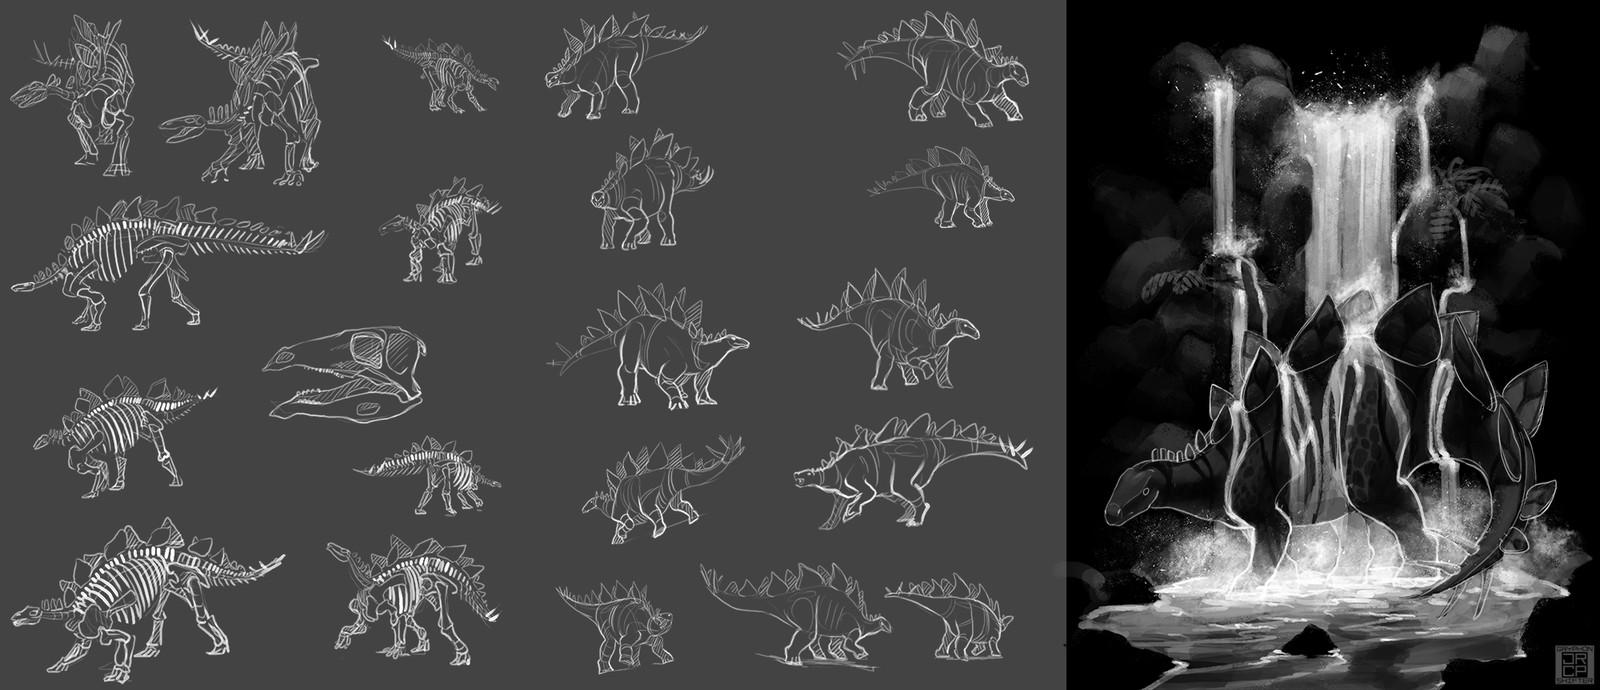 5: Stegosaurus